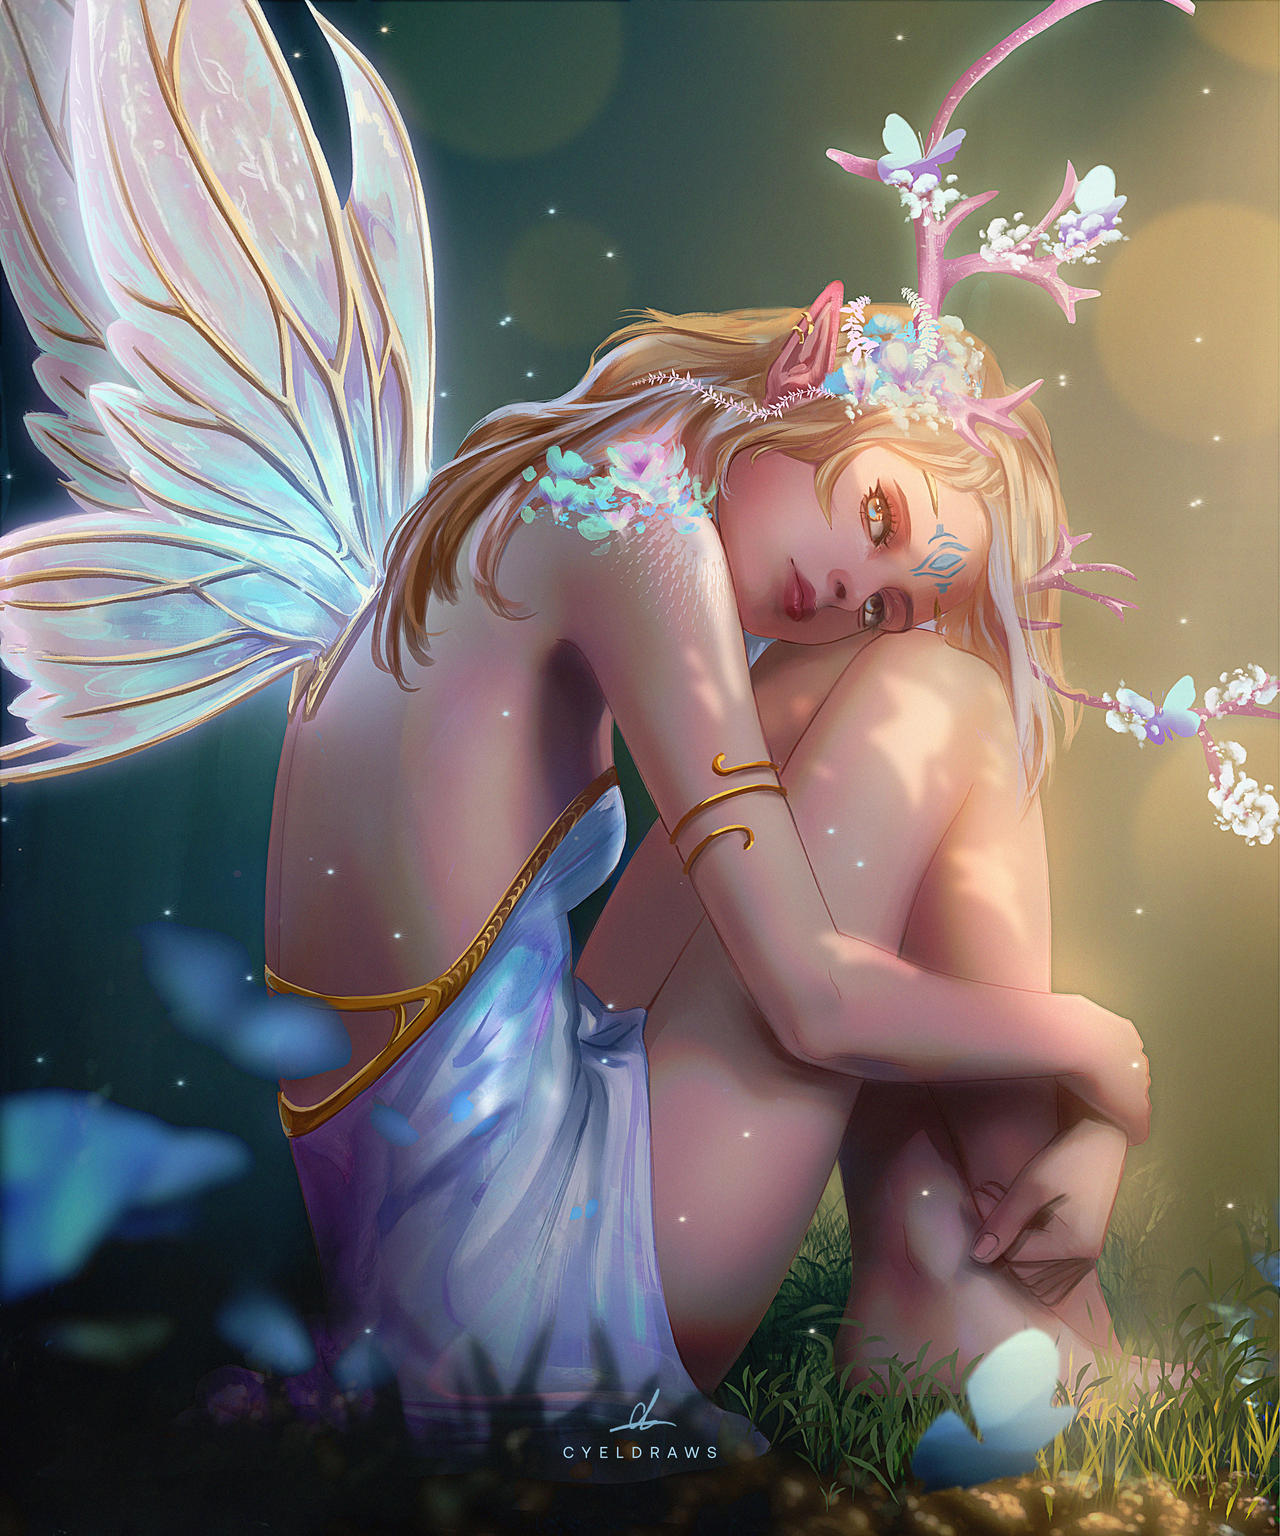 Фото Девушка с крылышками бабочки и рожками на голове, by cyeldraws